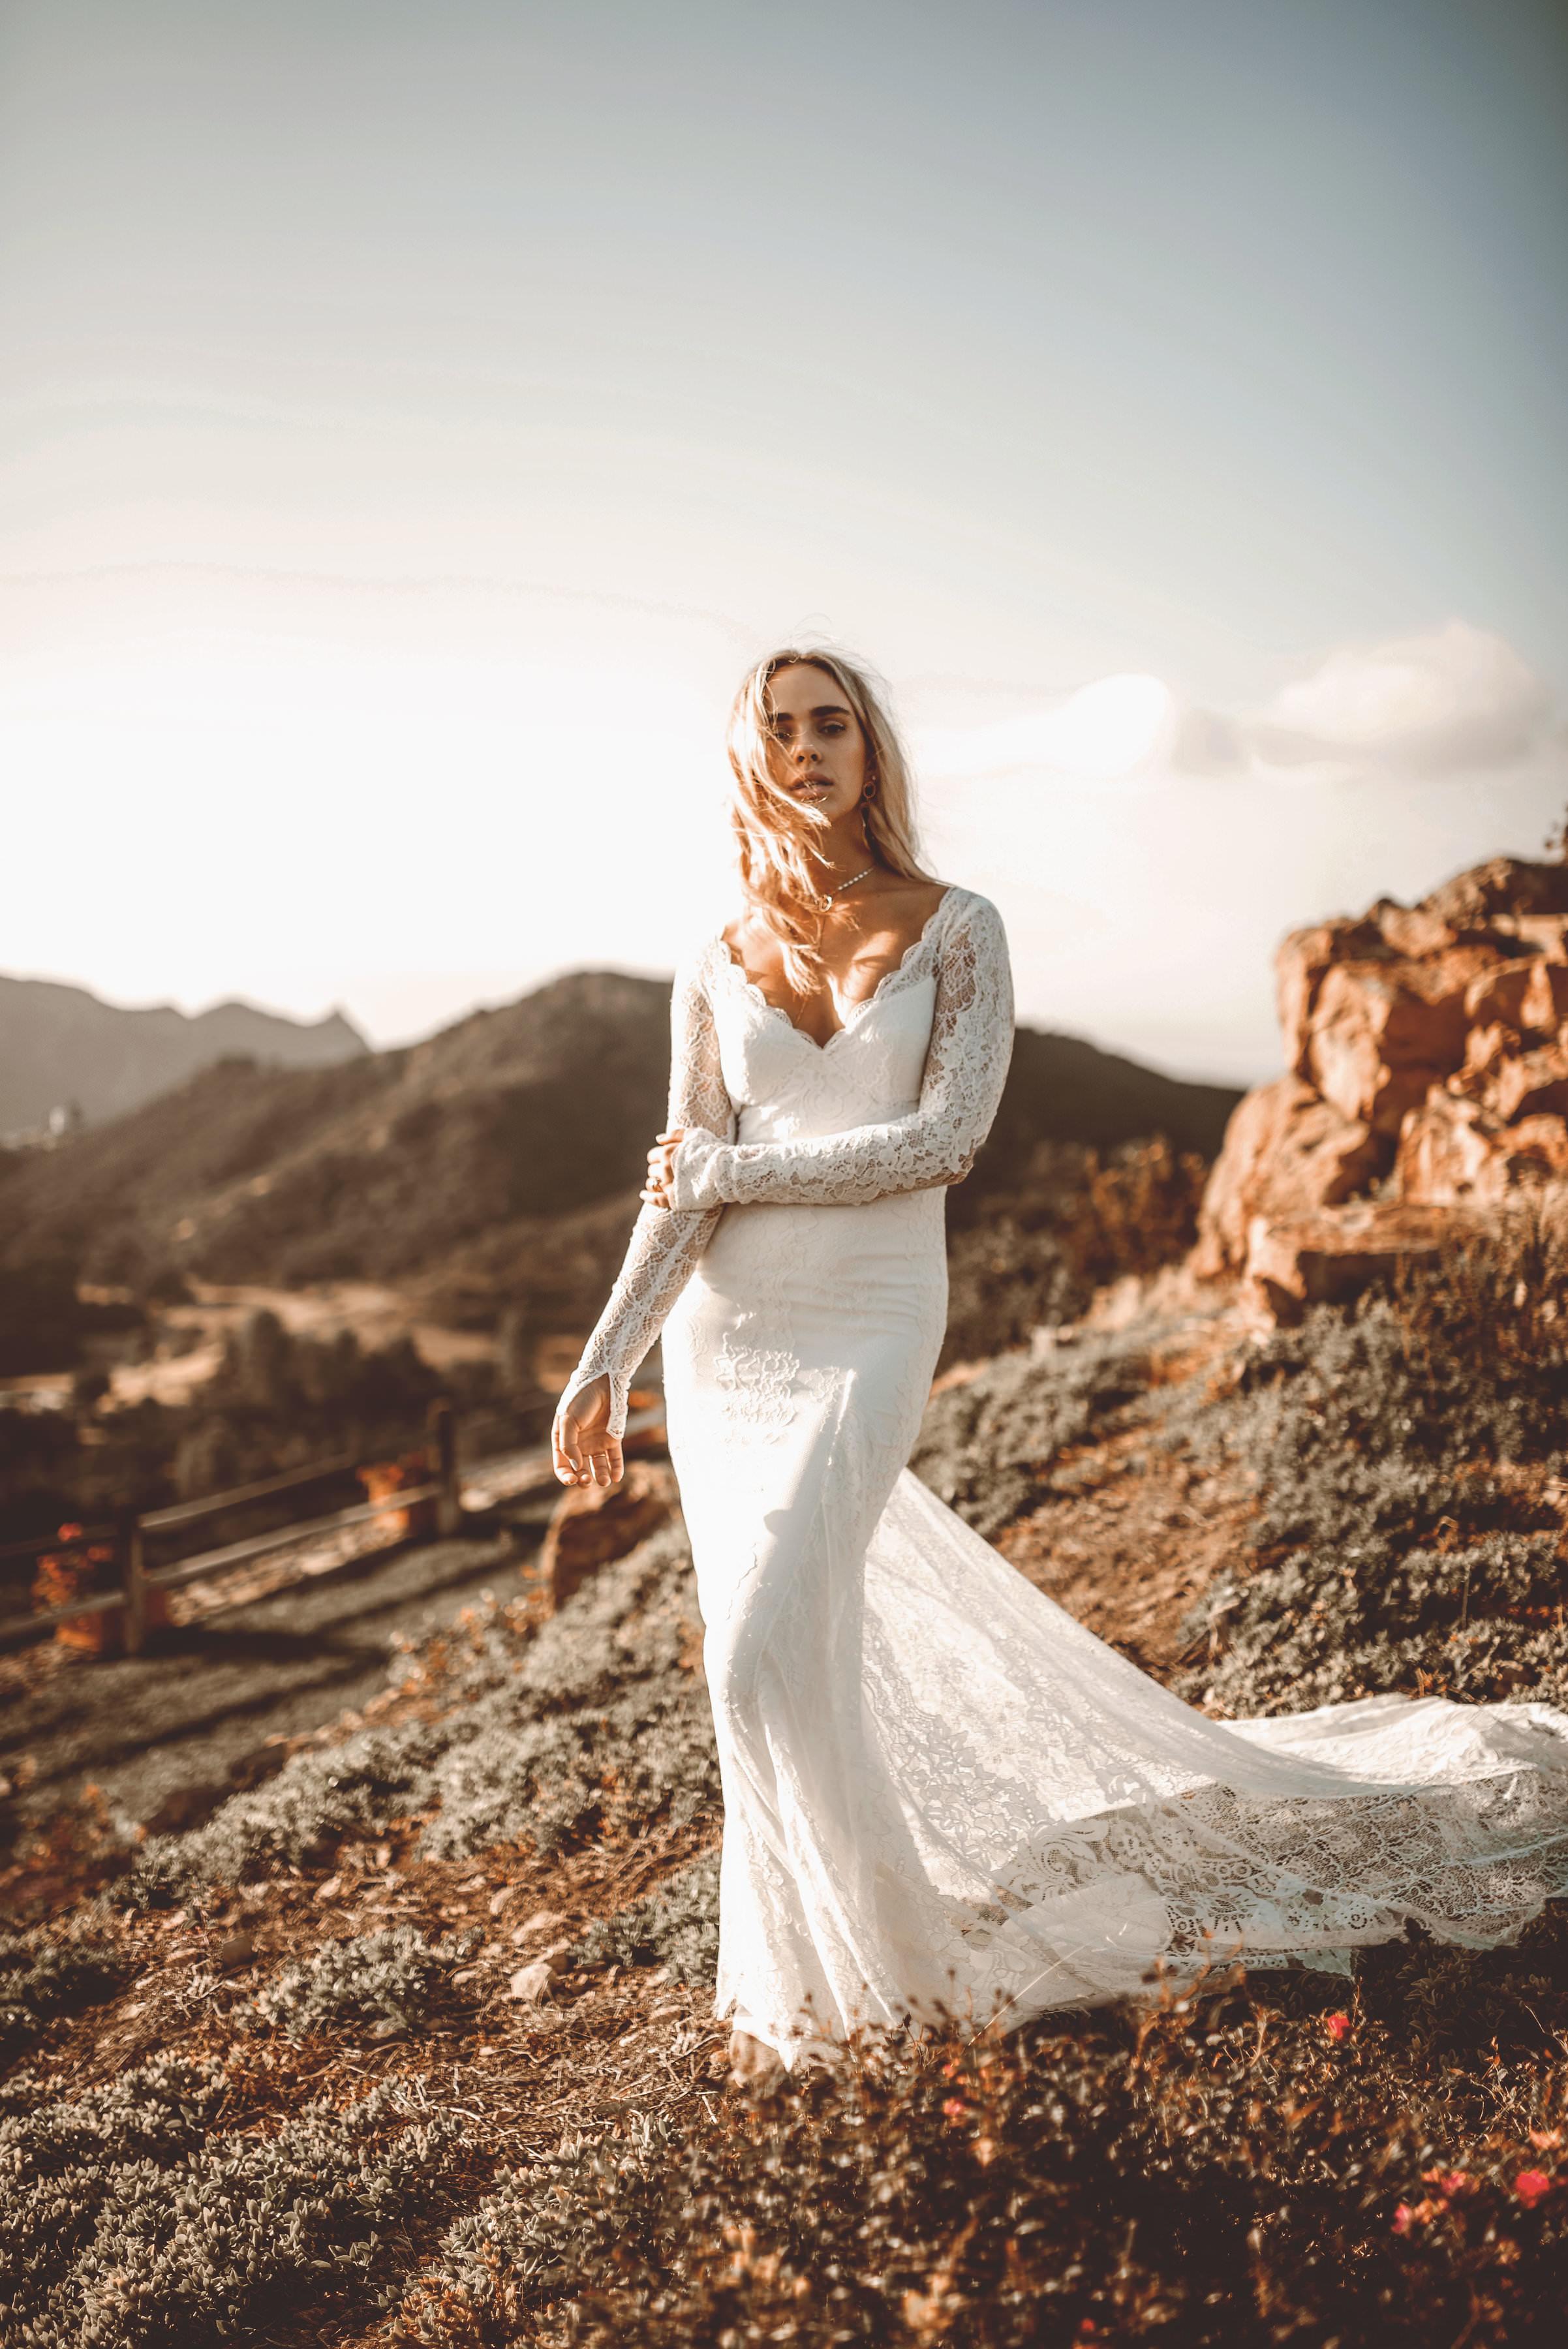 Riley-wedding-dress-lovers-society